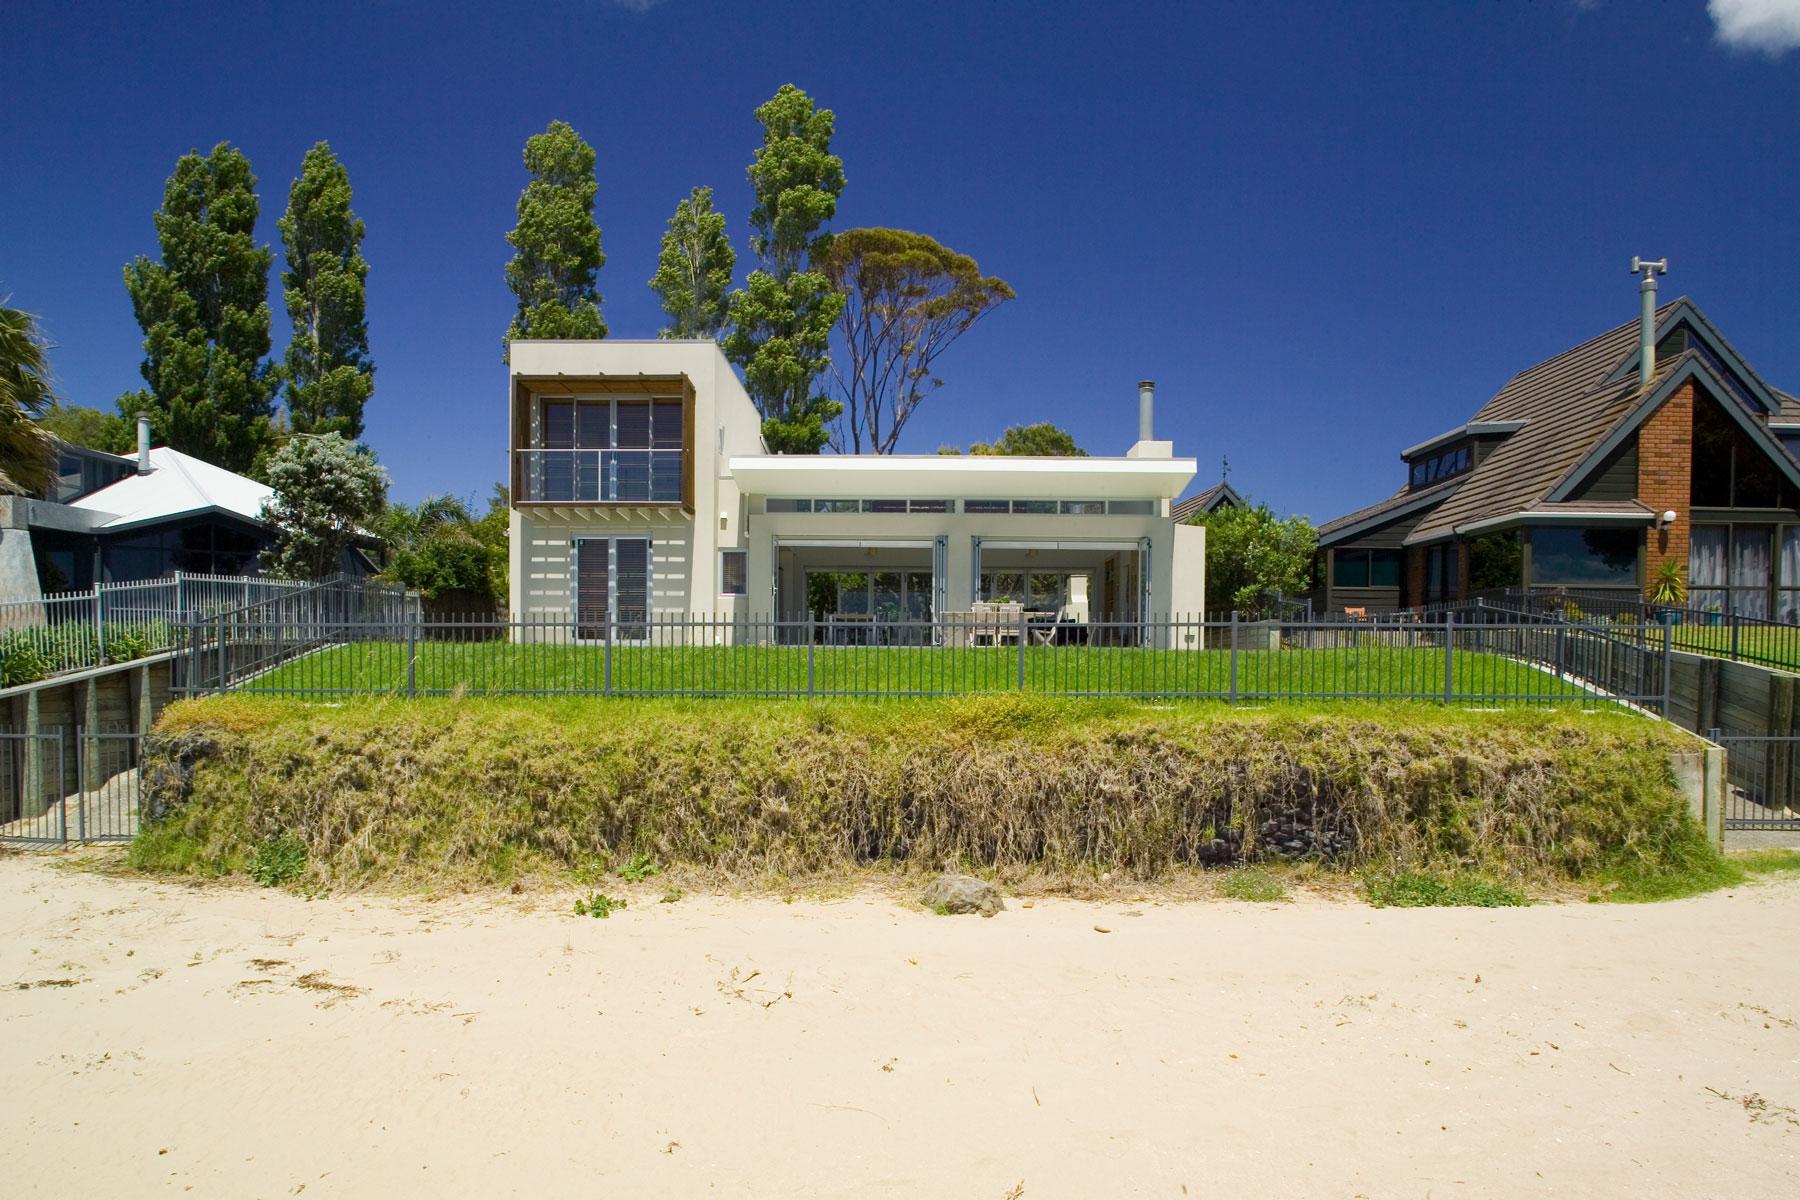 S Leuschke Kahn Architects_StanmoreBay LKA_F2J95831.jpg